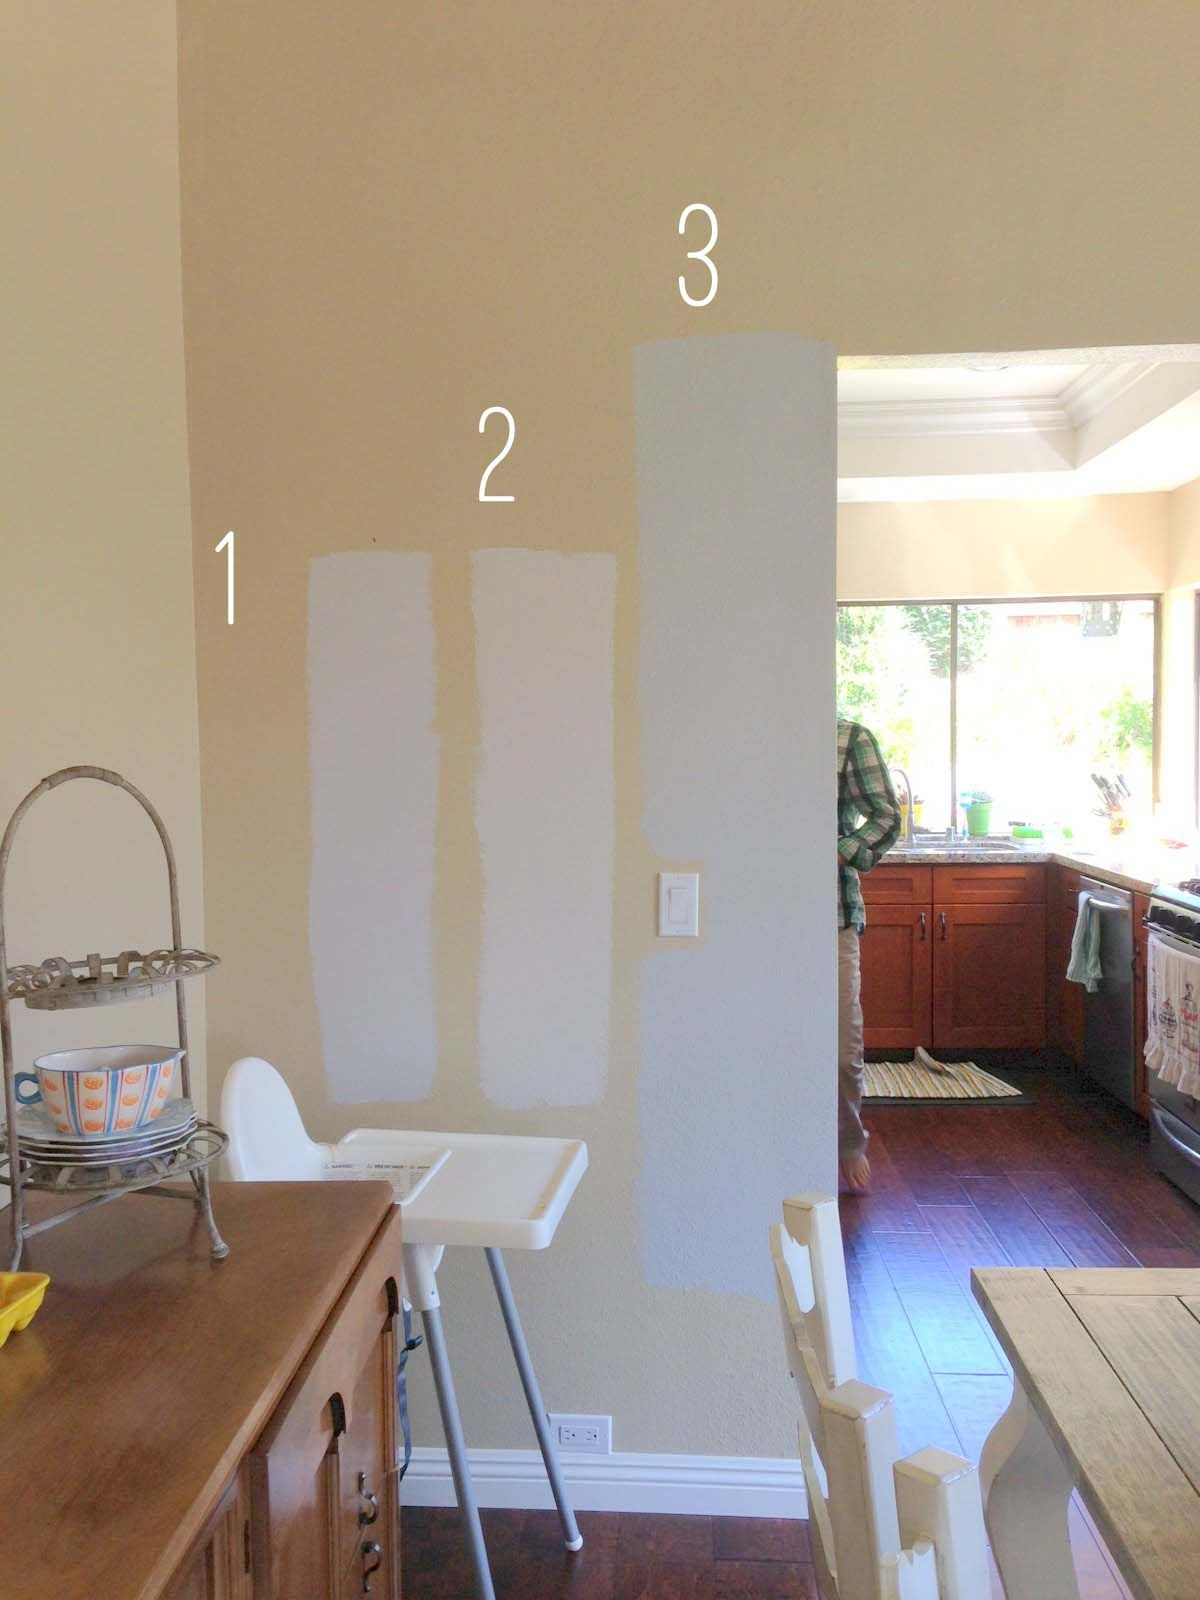 1 Grayish Sw 6001 2 Pediment Sw 7634 3 Light French Gray Sw 0055 Paint Pinterest